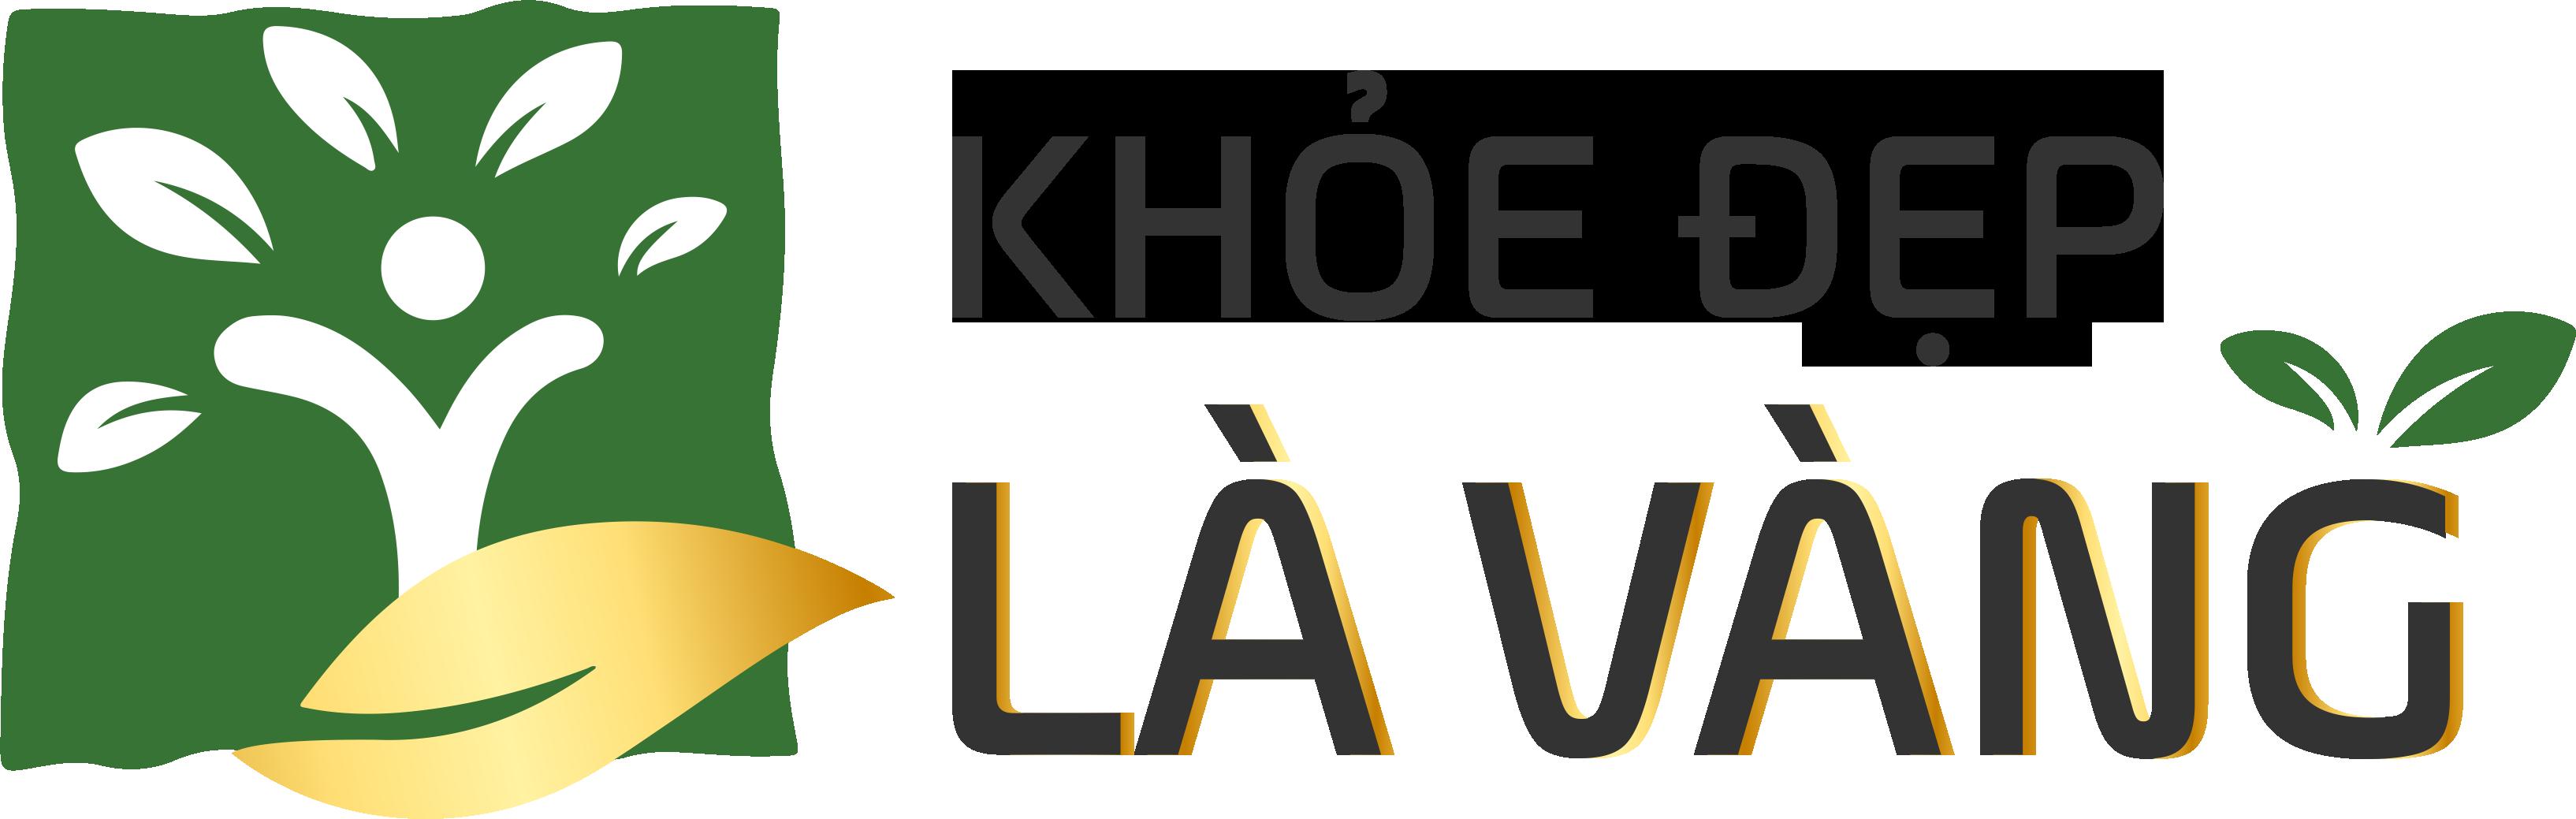 Logo khoedeplavang.com